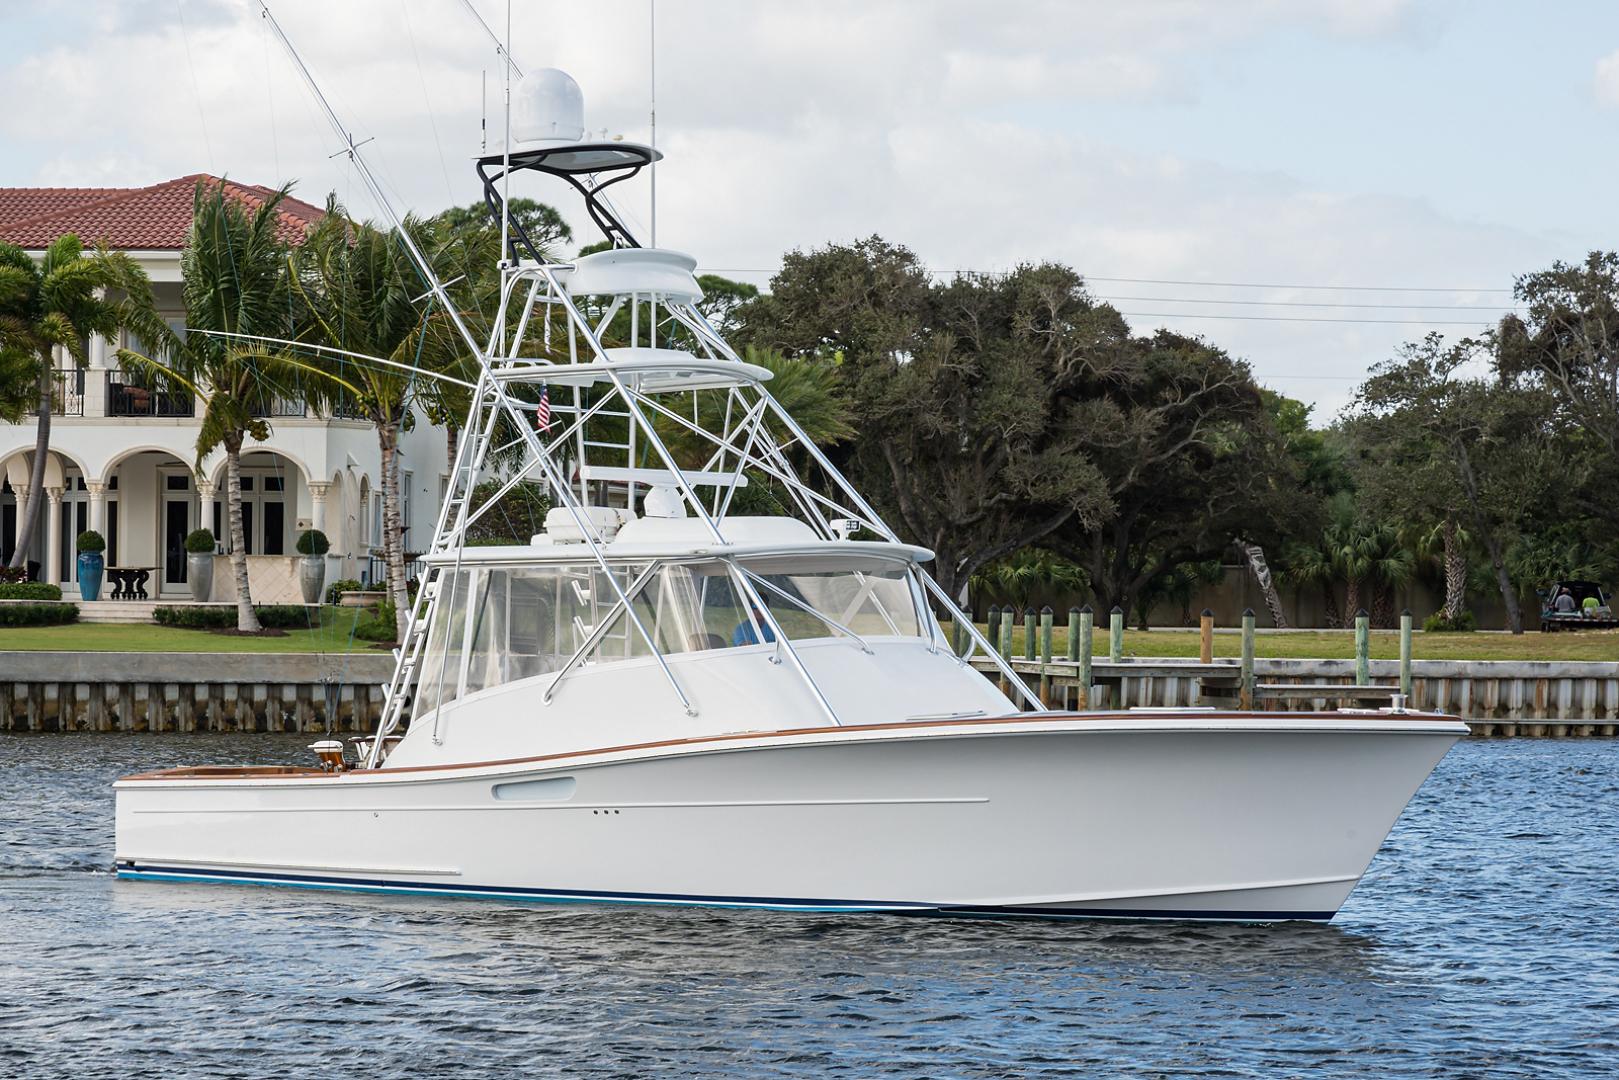 Release-One-of-A-Kind Custom Express 2014-Gladiator Jupiter-Florida-United States-Gladiator-1370078   Thumbnail